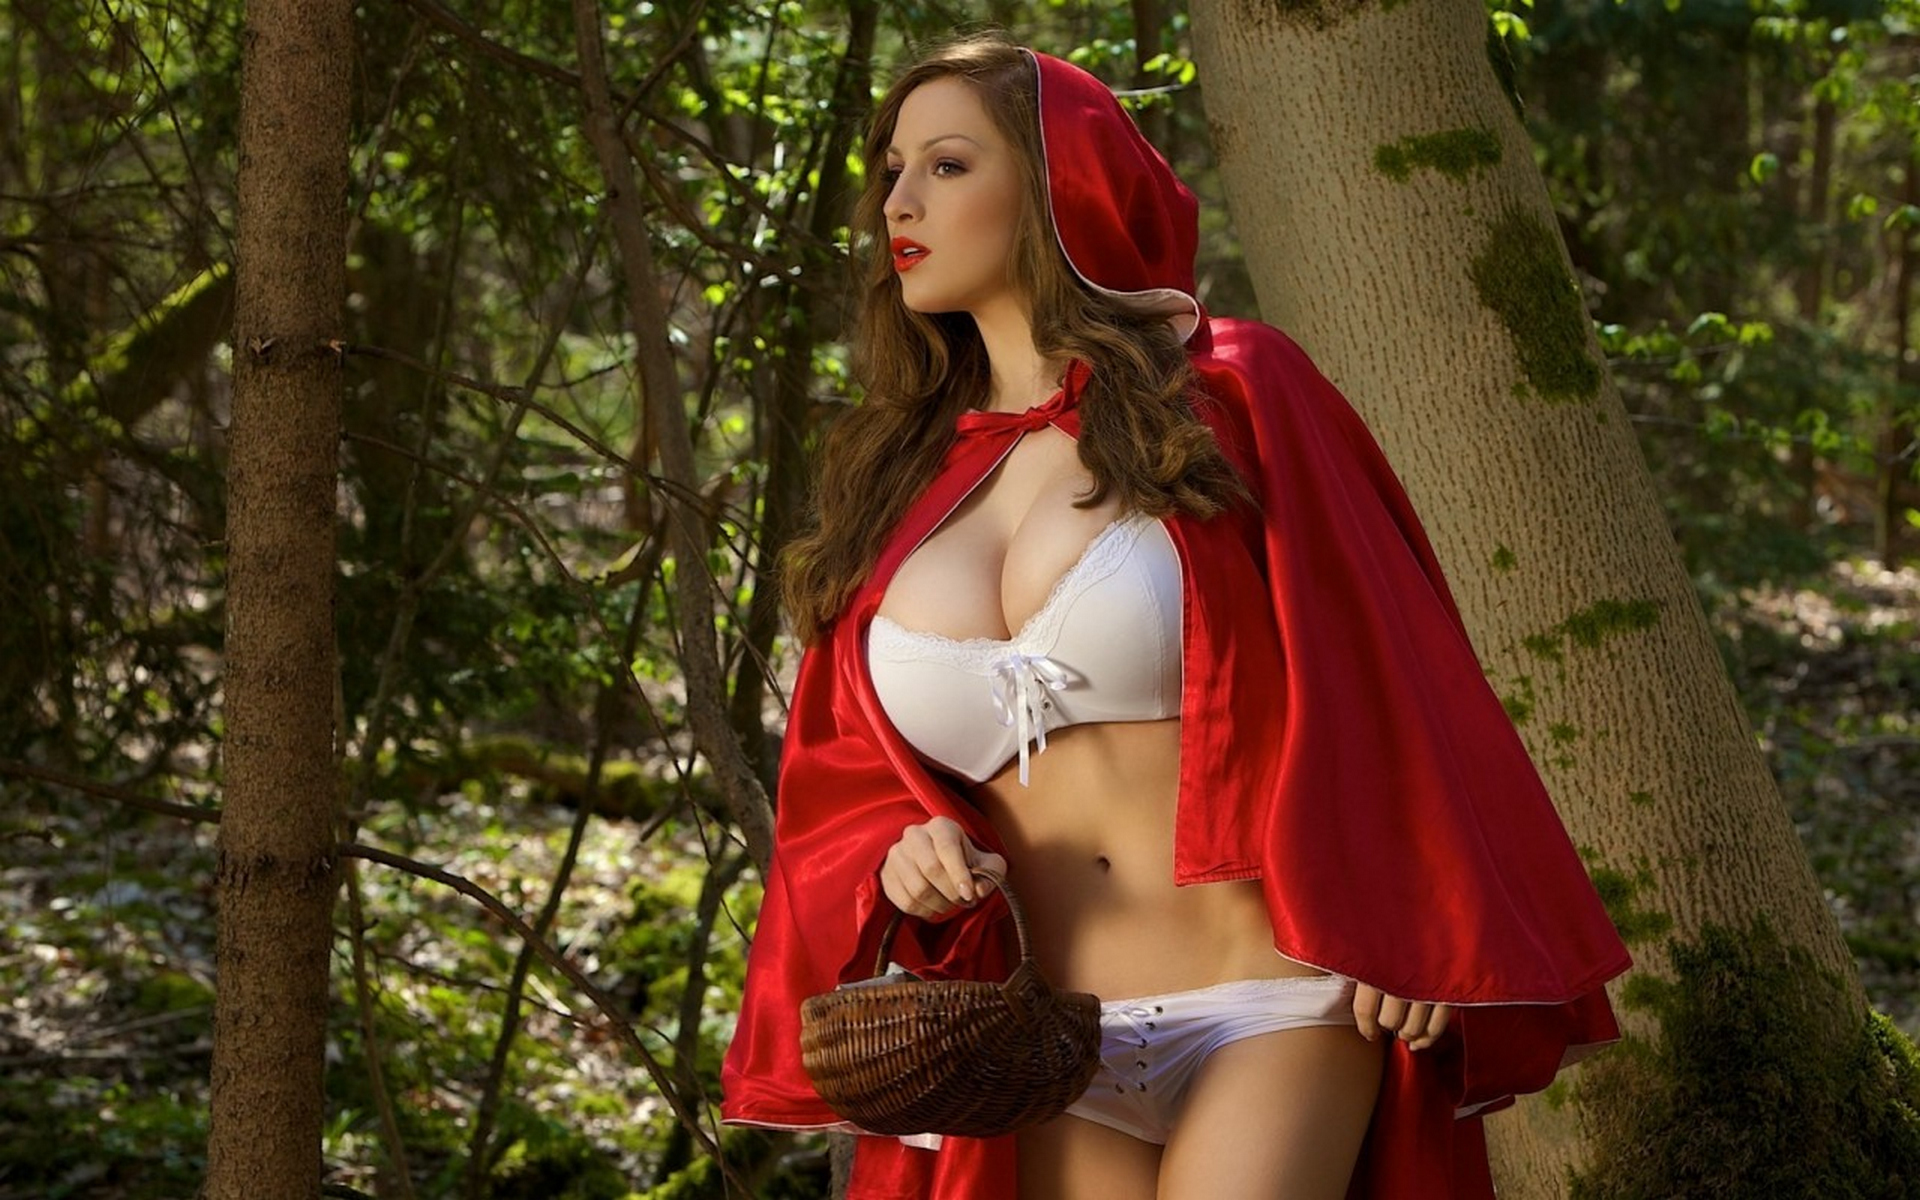 Про красную шапочку эротика онлайн бесплатно 20 фотография